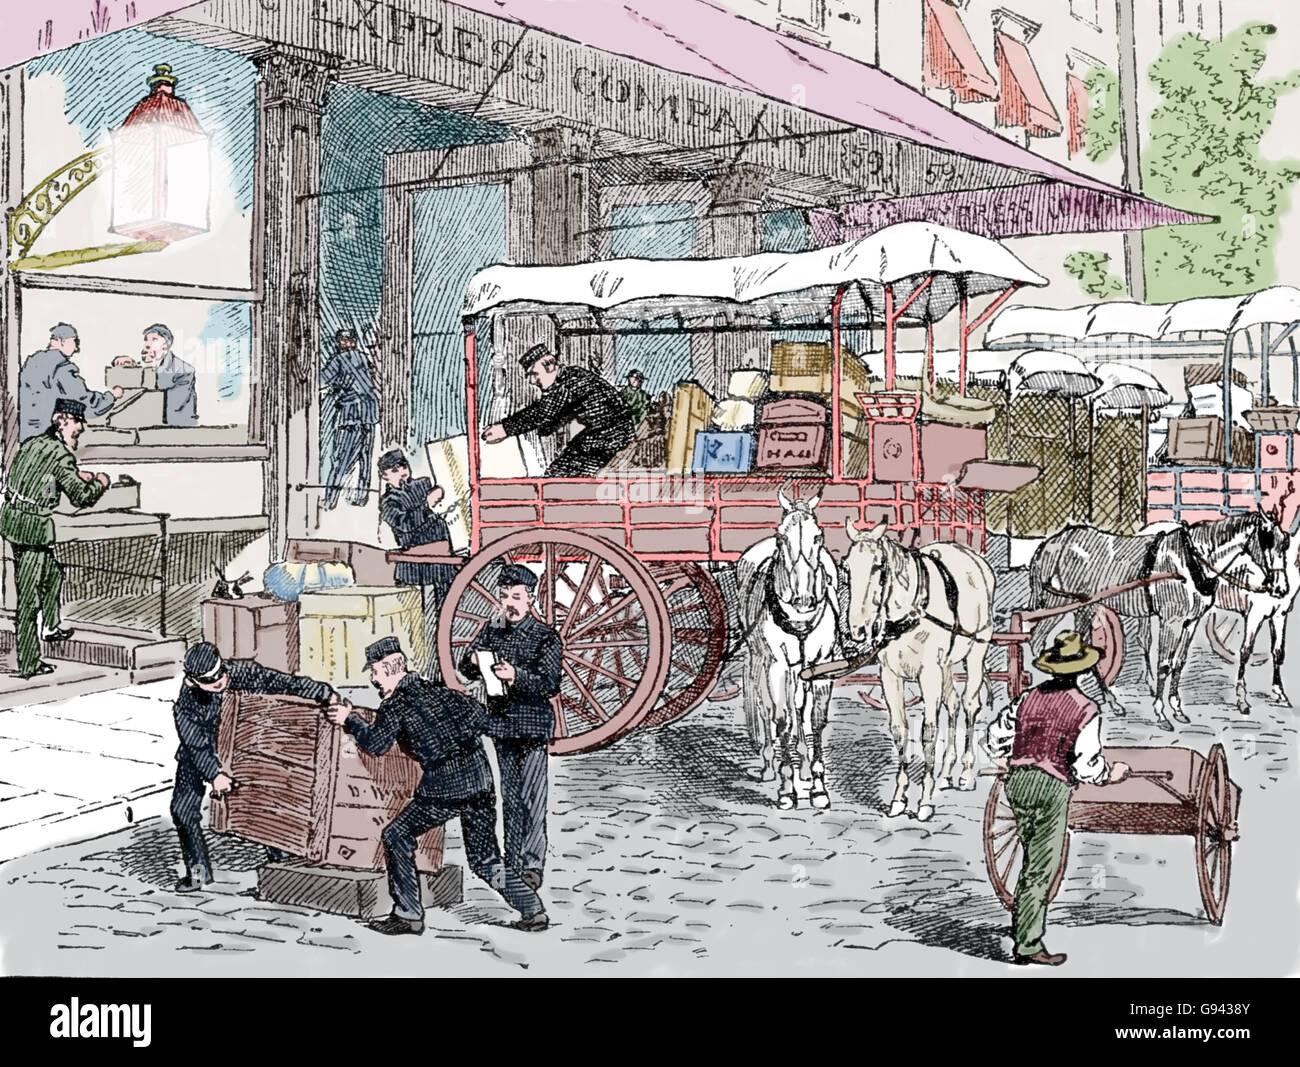 Le service des messagers. Express Company. Usa. 19e siècle. La gravure. Photo Stock